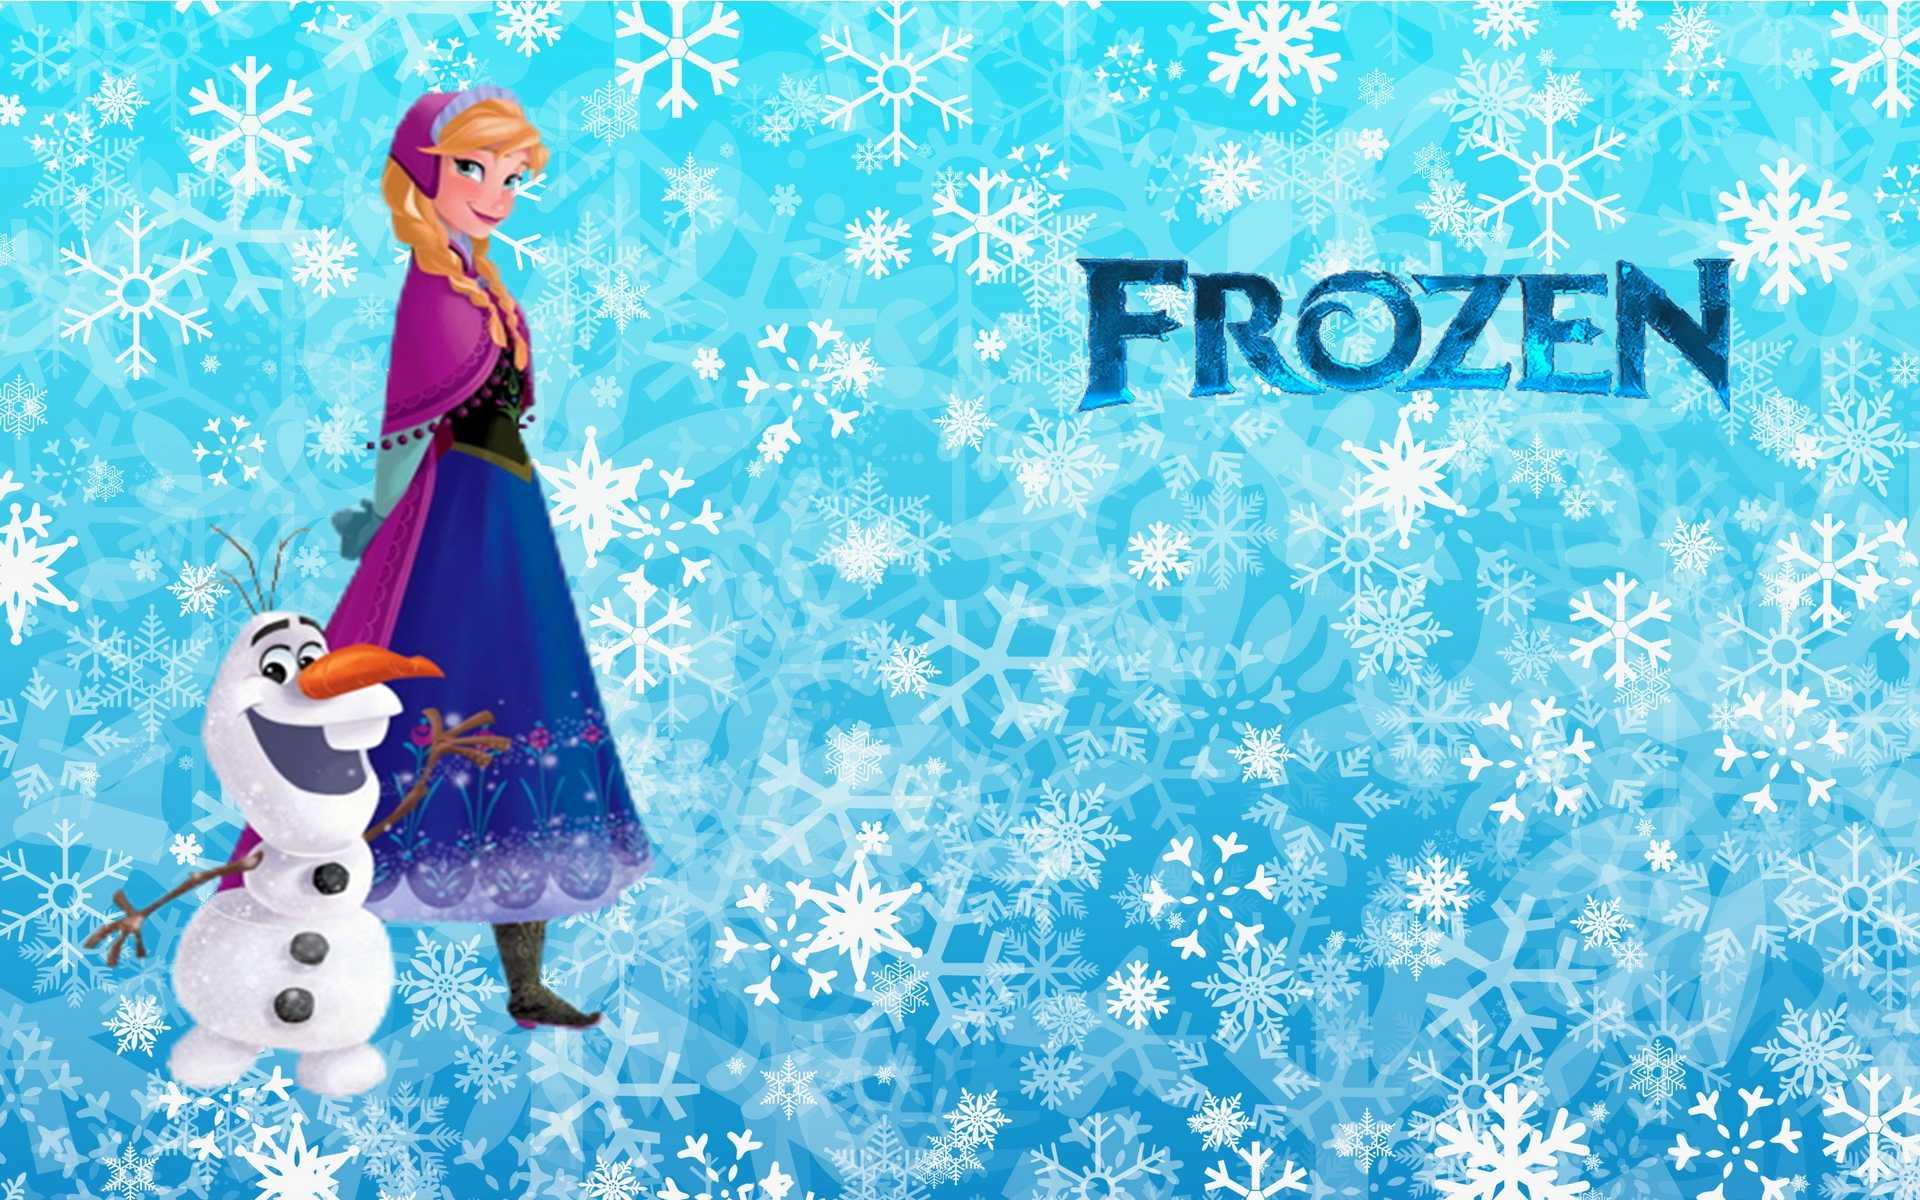 Duke Quotes Wallpaper Cartoon Disney Frozen Backgrounds Pixelstalk Net